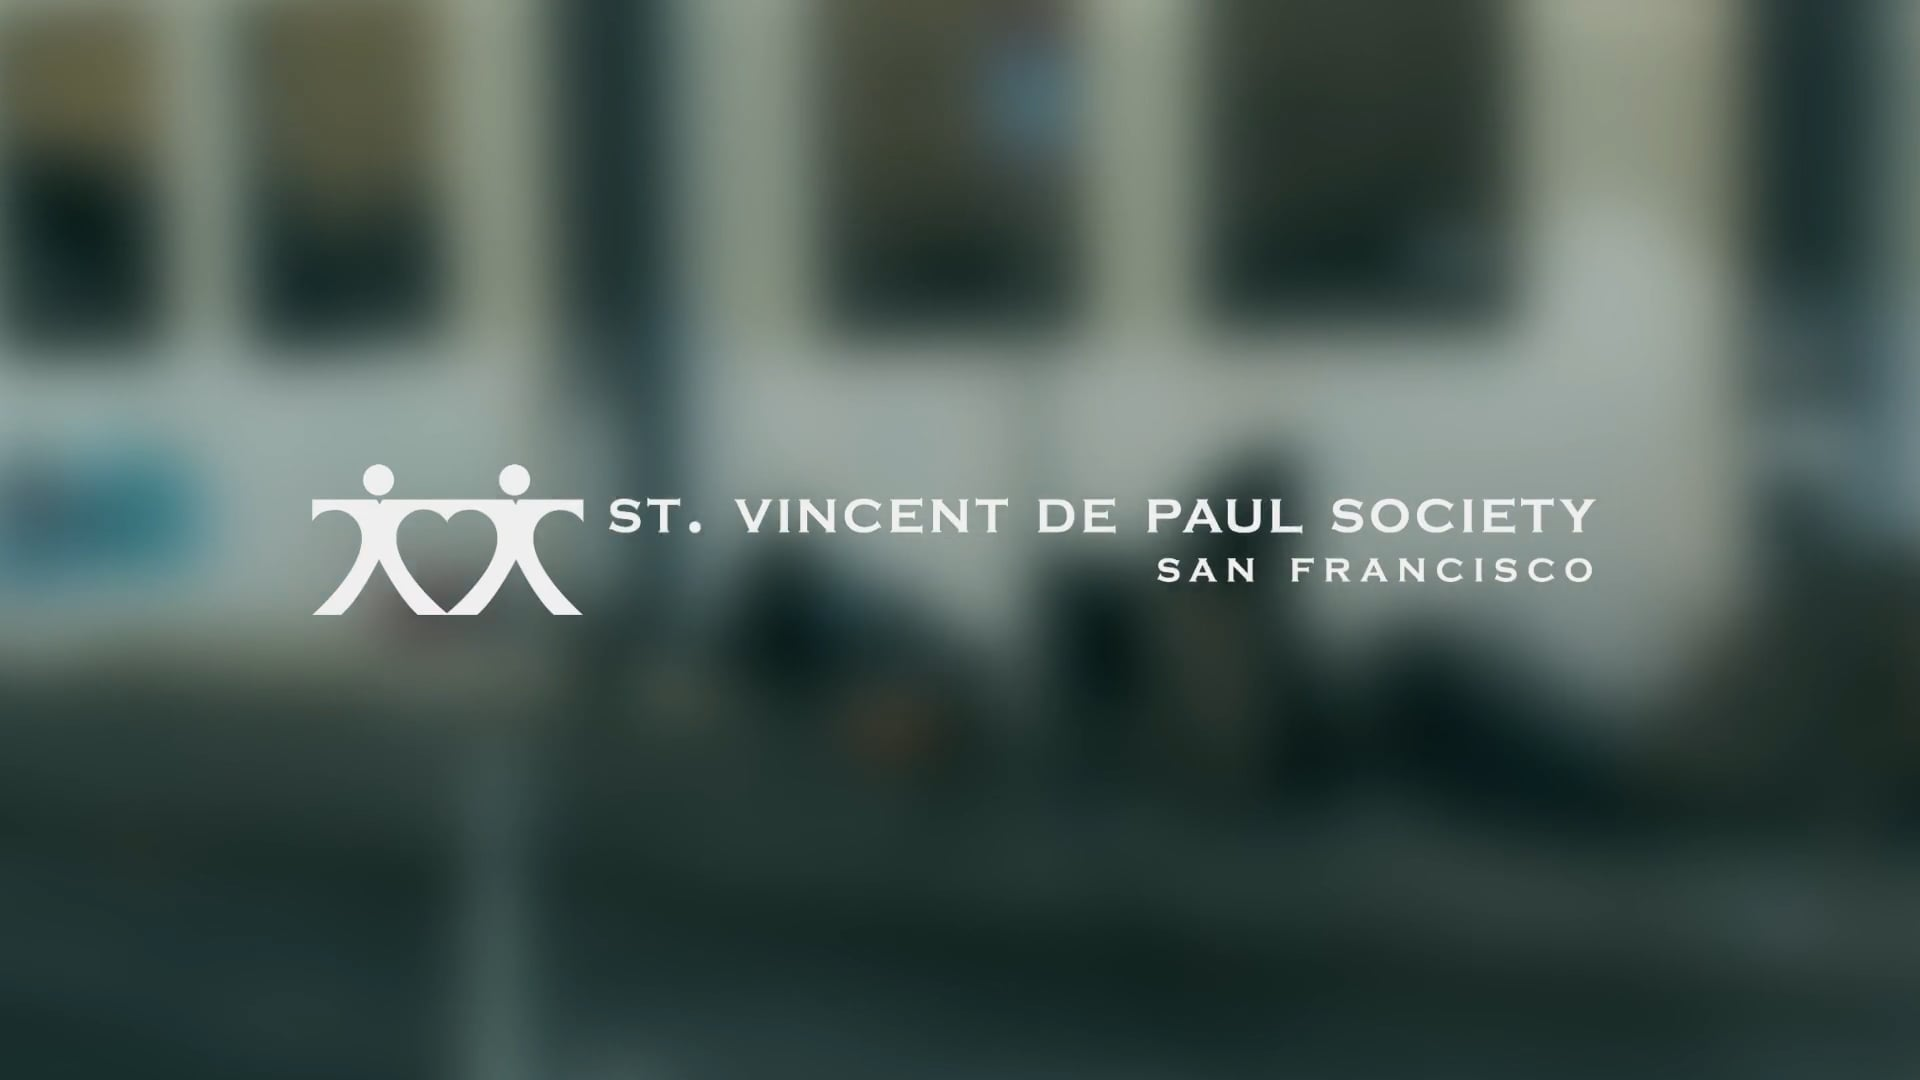 HOMELESS SHELTER St VINCENT DE PAUL  (SAN FRANCISCO) DURING COVID 19